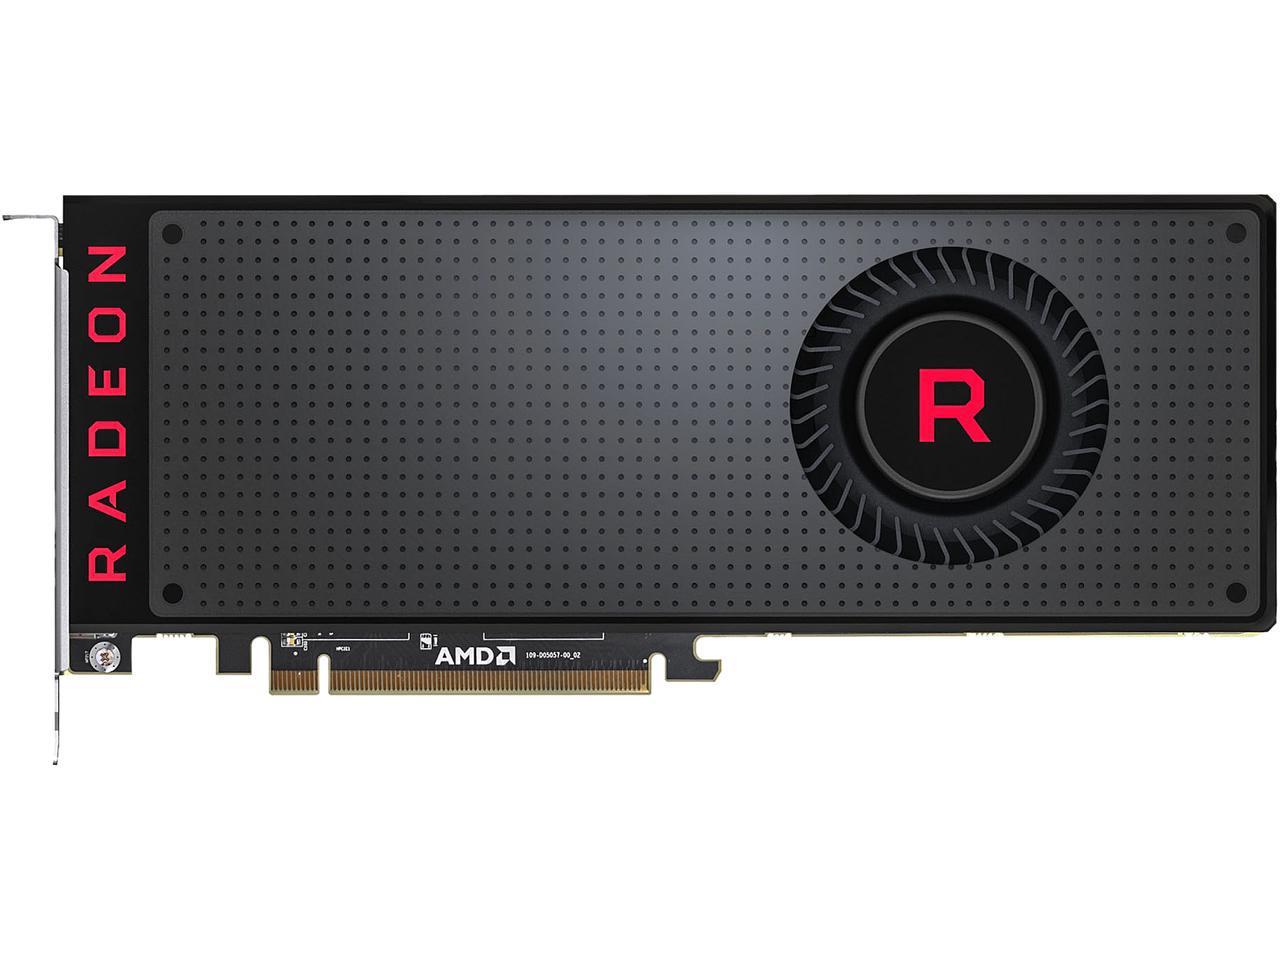 PowerColor Radeon RX VEGA 64 $539.99